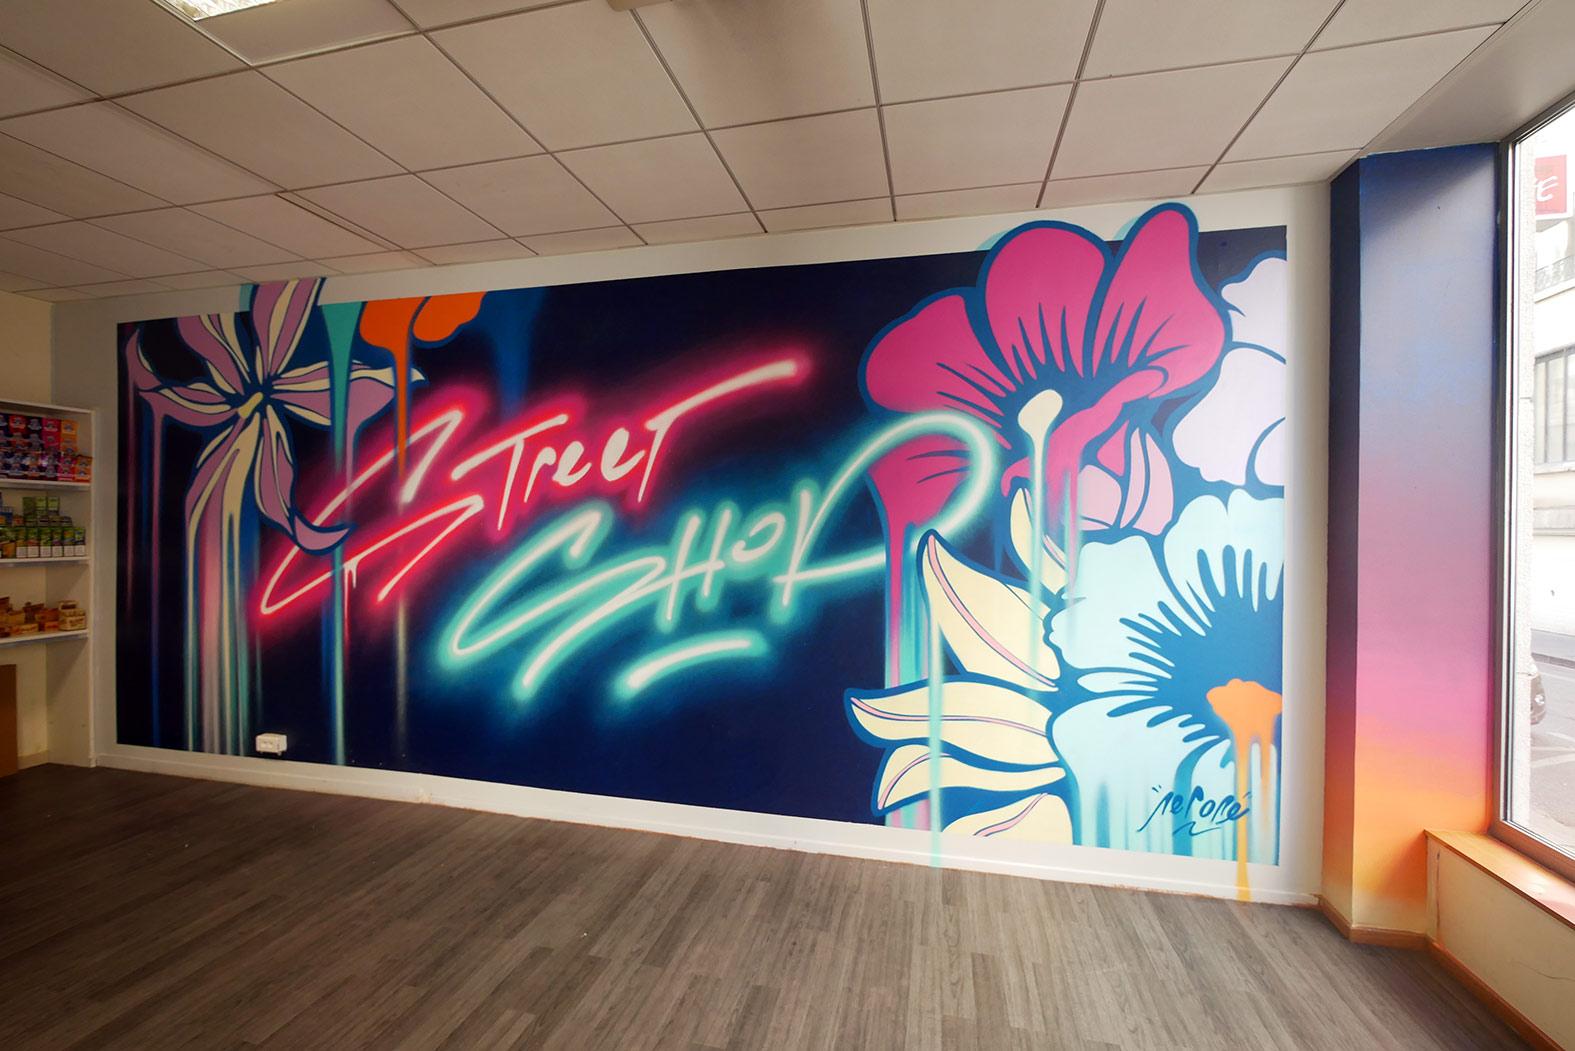 Nerone-street-shop-graffiti-1